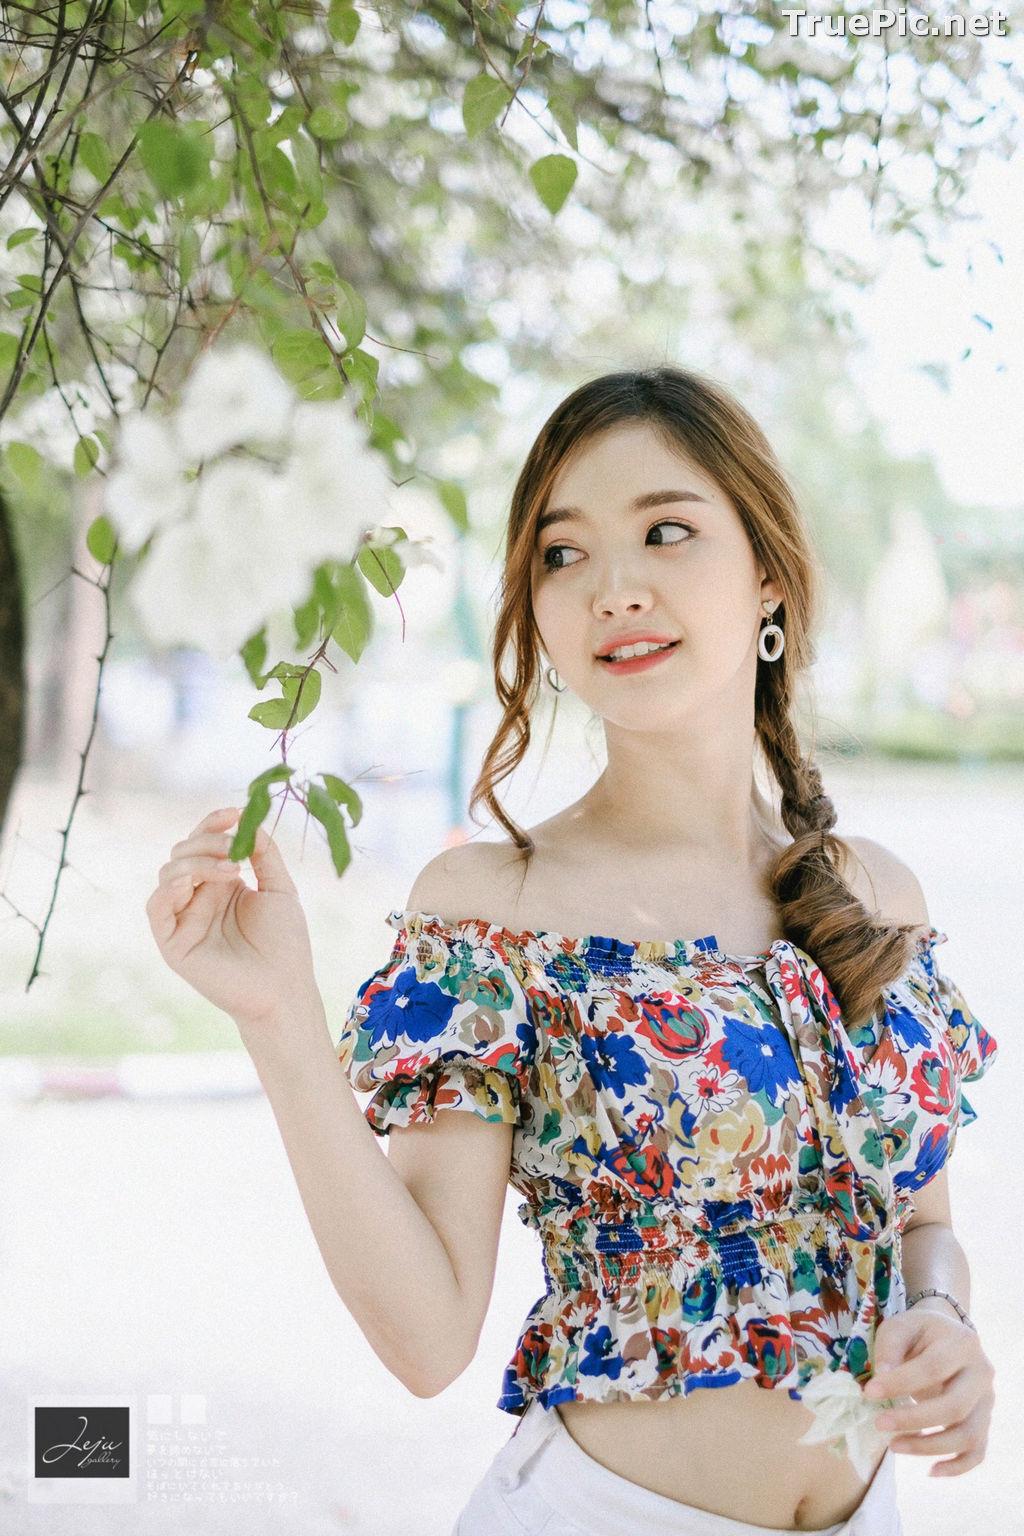 Image Thailand Beautiful Model - Viva Pongdechkajorn - Tetta Viva - TruePic.net - Picture-9